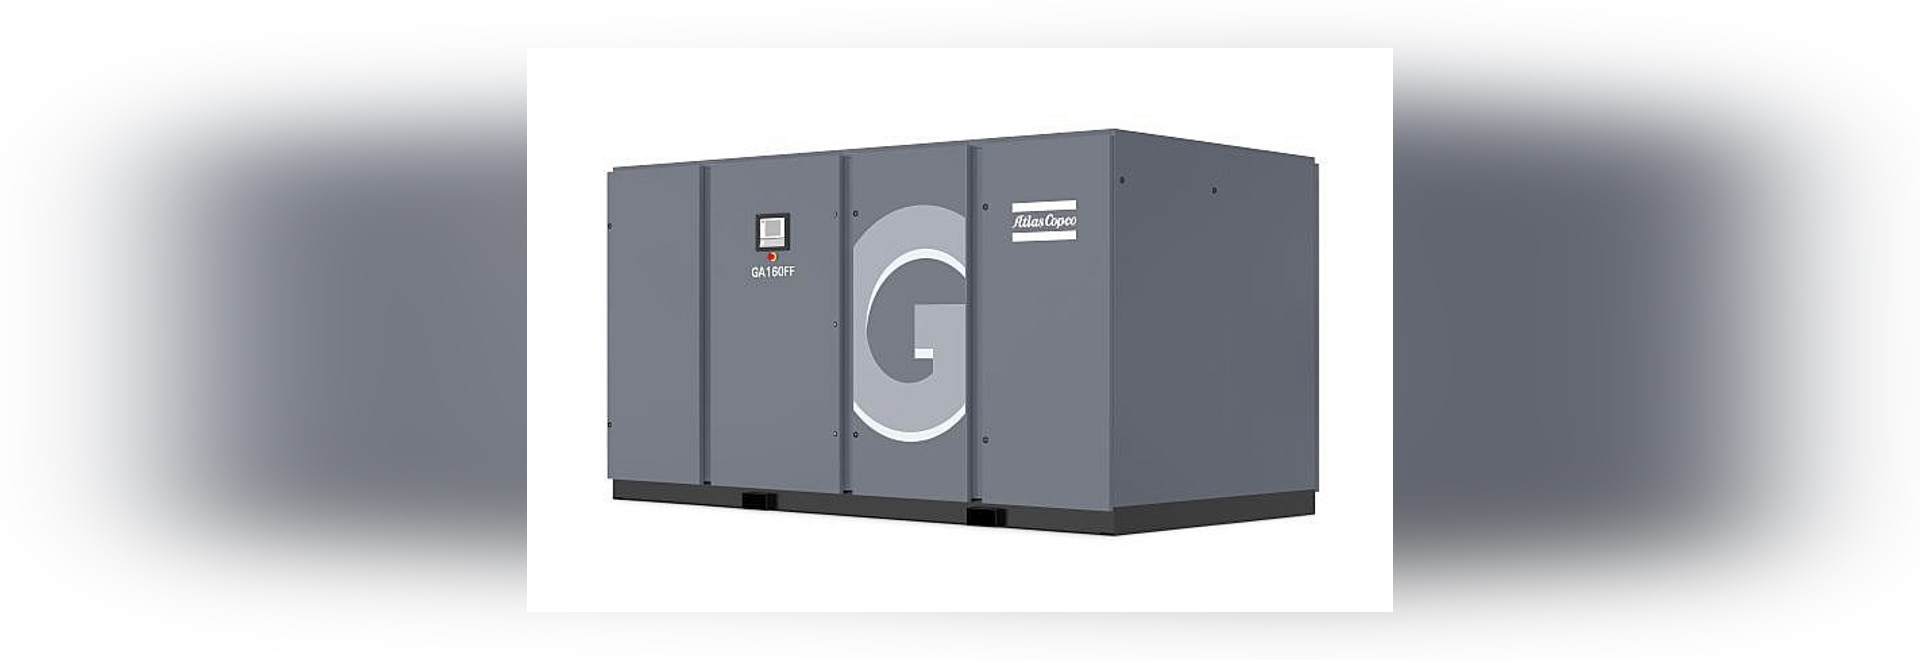 New energy savers GA 90+-160 air compressors from Atlas Copco